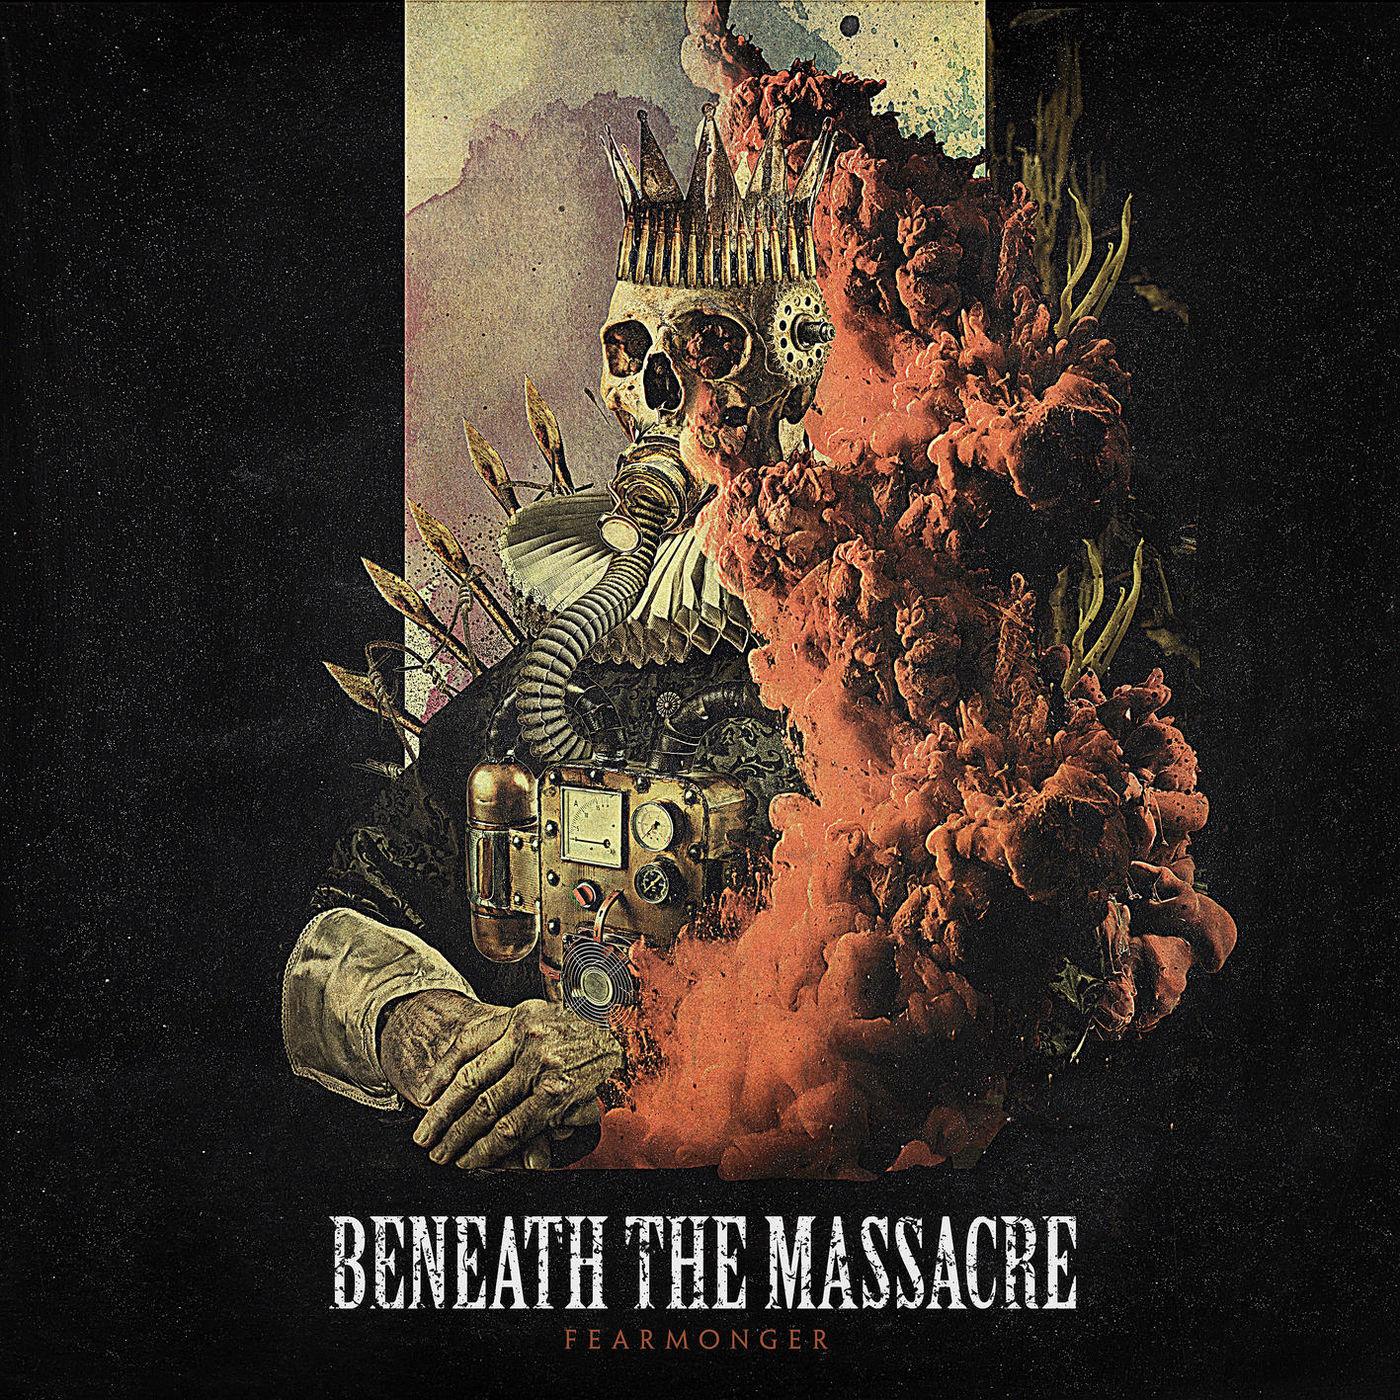 Beneath The Massacre - Rise of the Fearmonger [single] (2020)